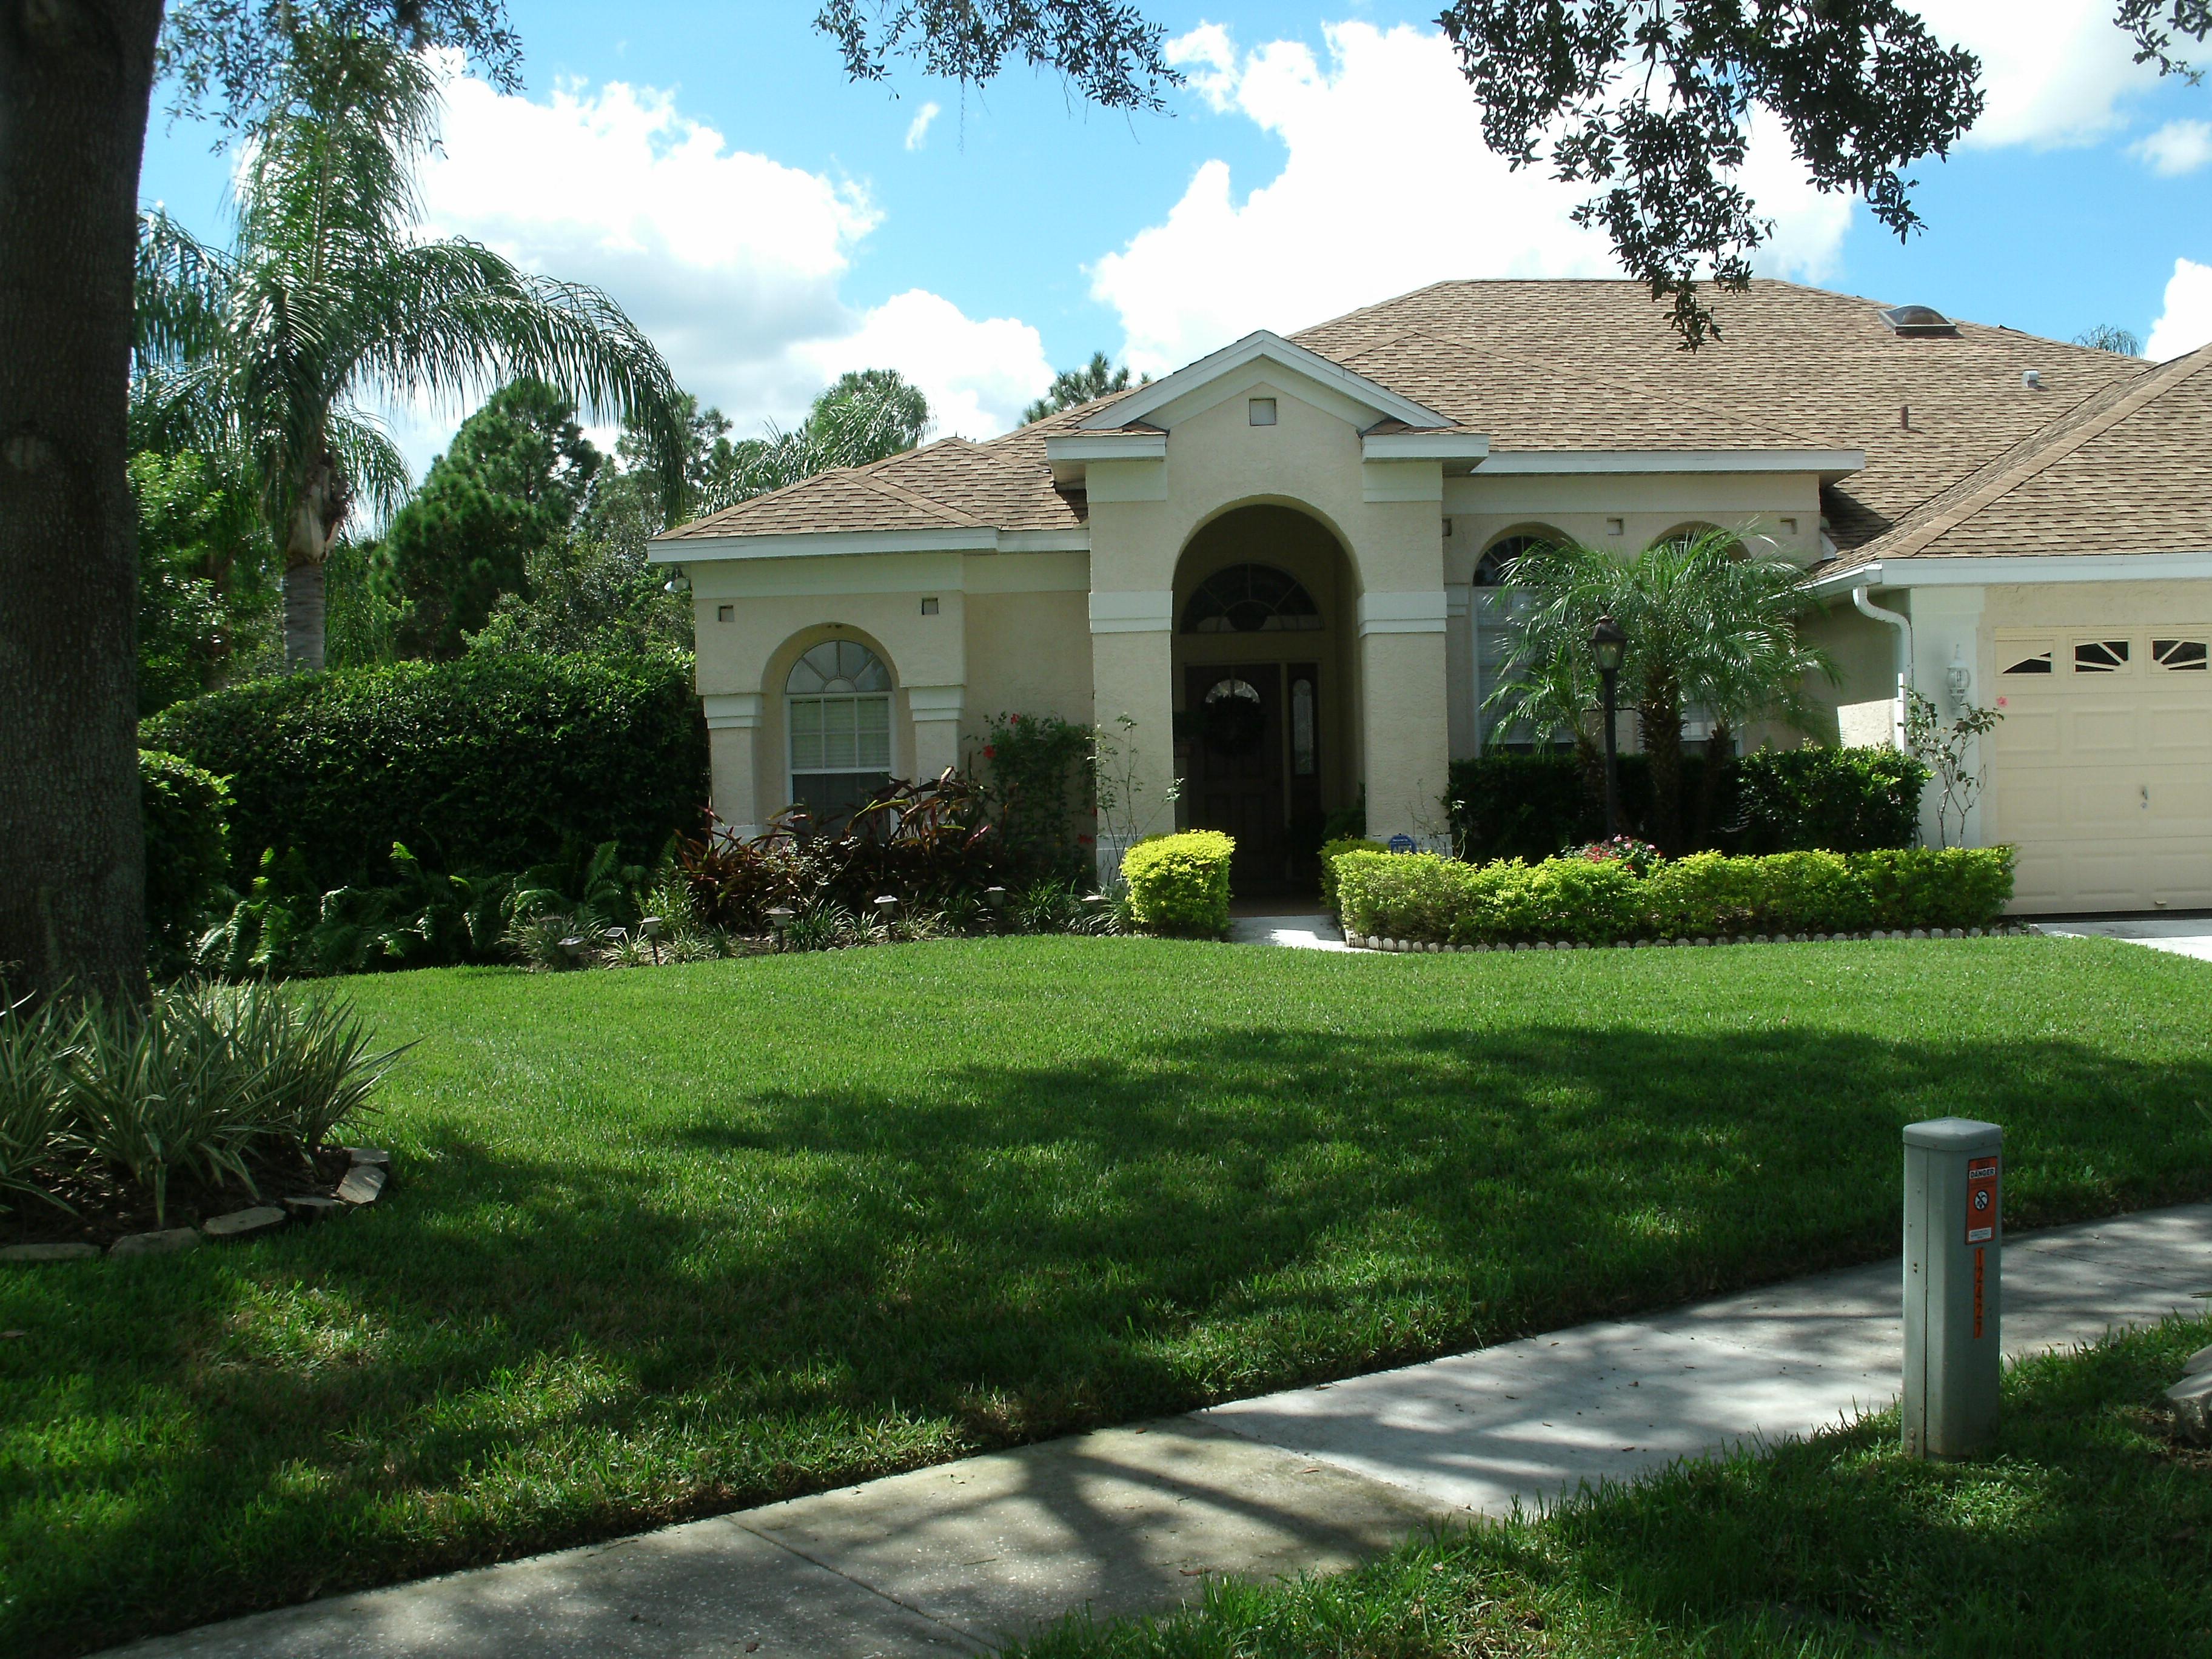 Yard mowing company in Tampa, FL, 33613